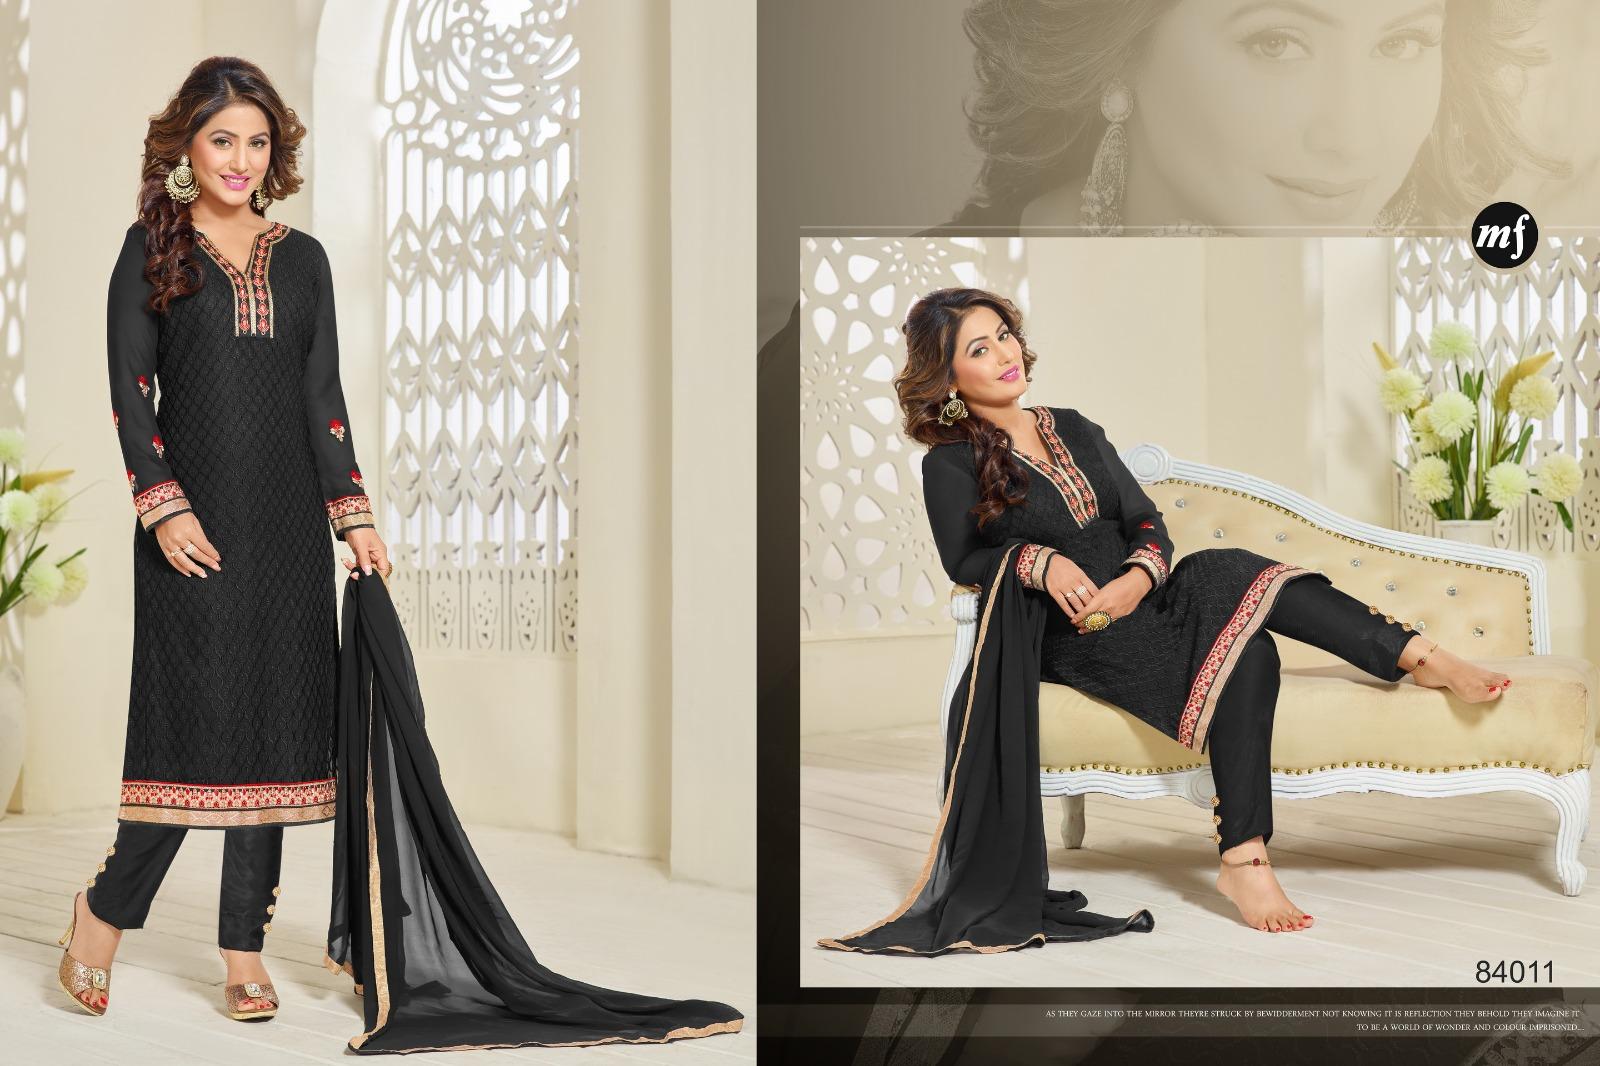 Tirupati Fabrics Hello Mahaveer Fashion Surat Good Afternoon Sir We Are Launching Our Super